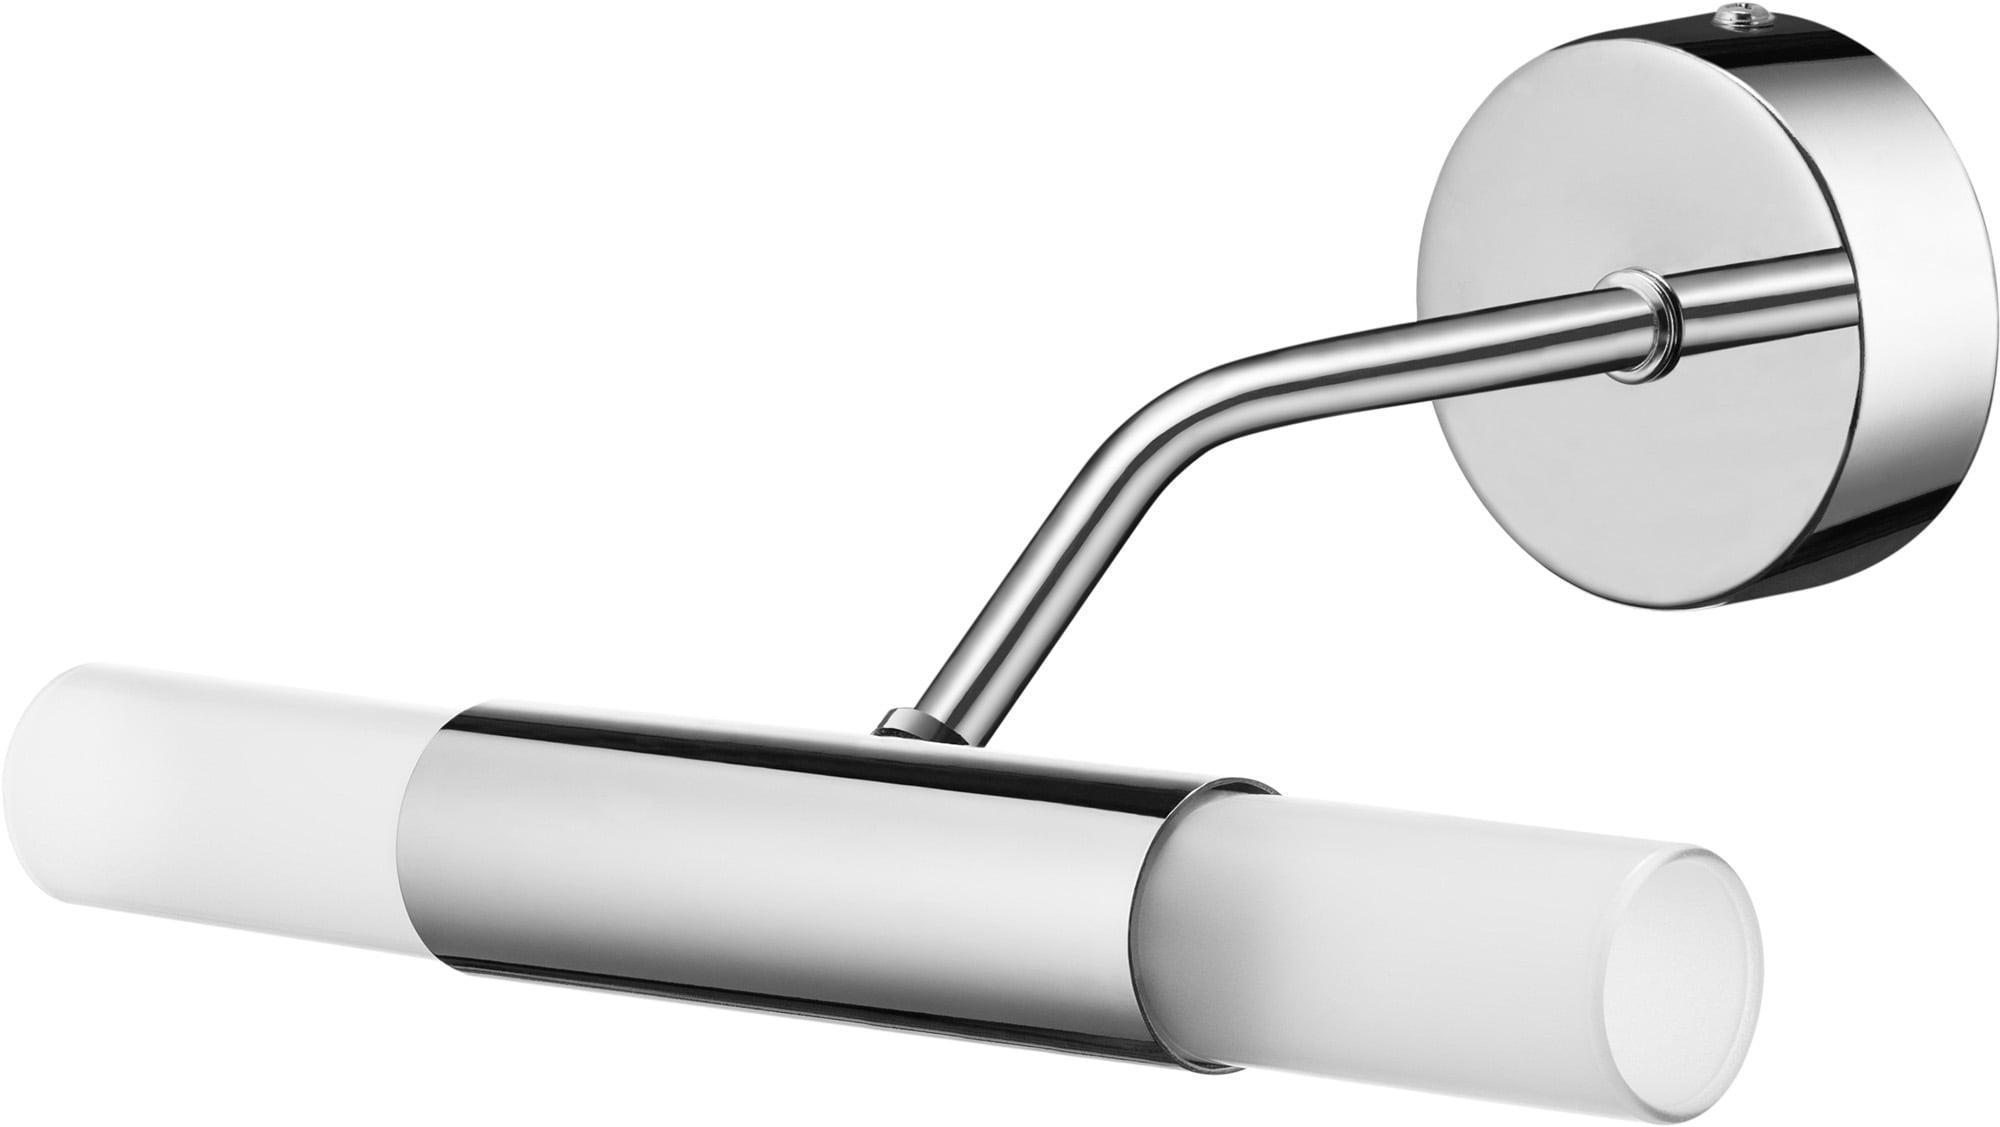 Double-sided Kinkiet Aquatic chrome / white G9 40W